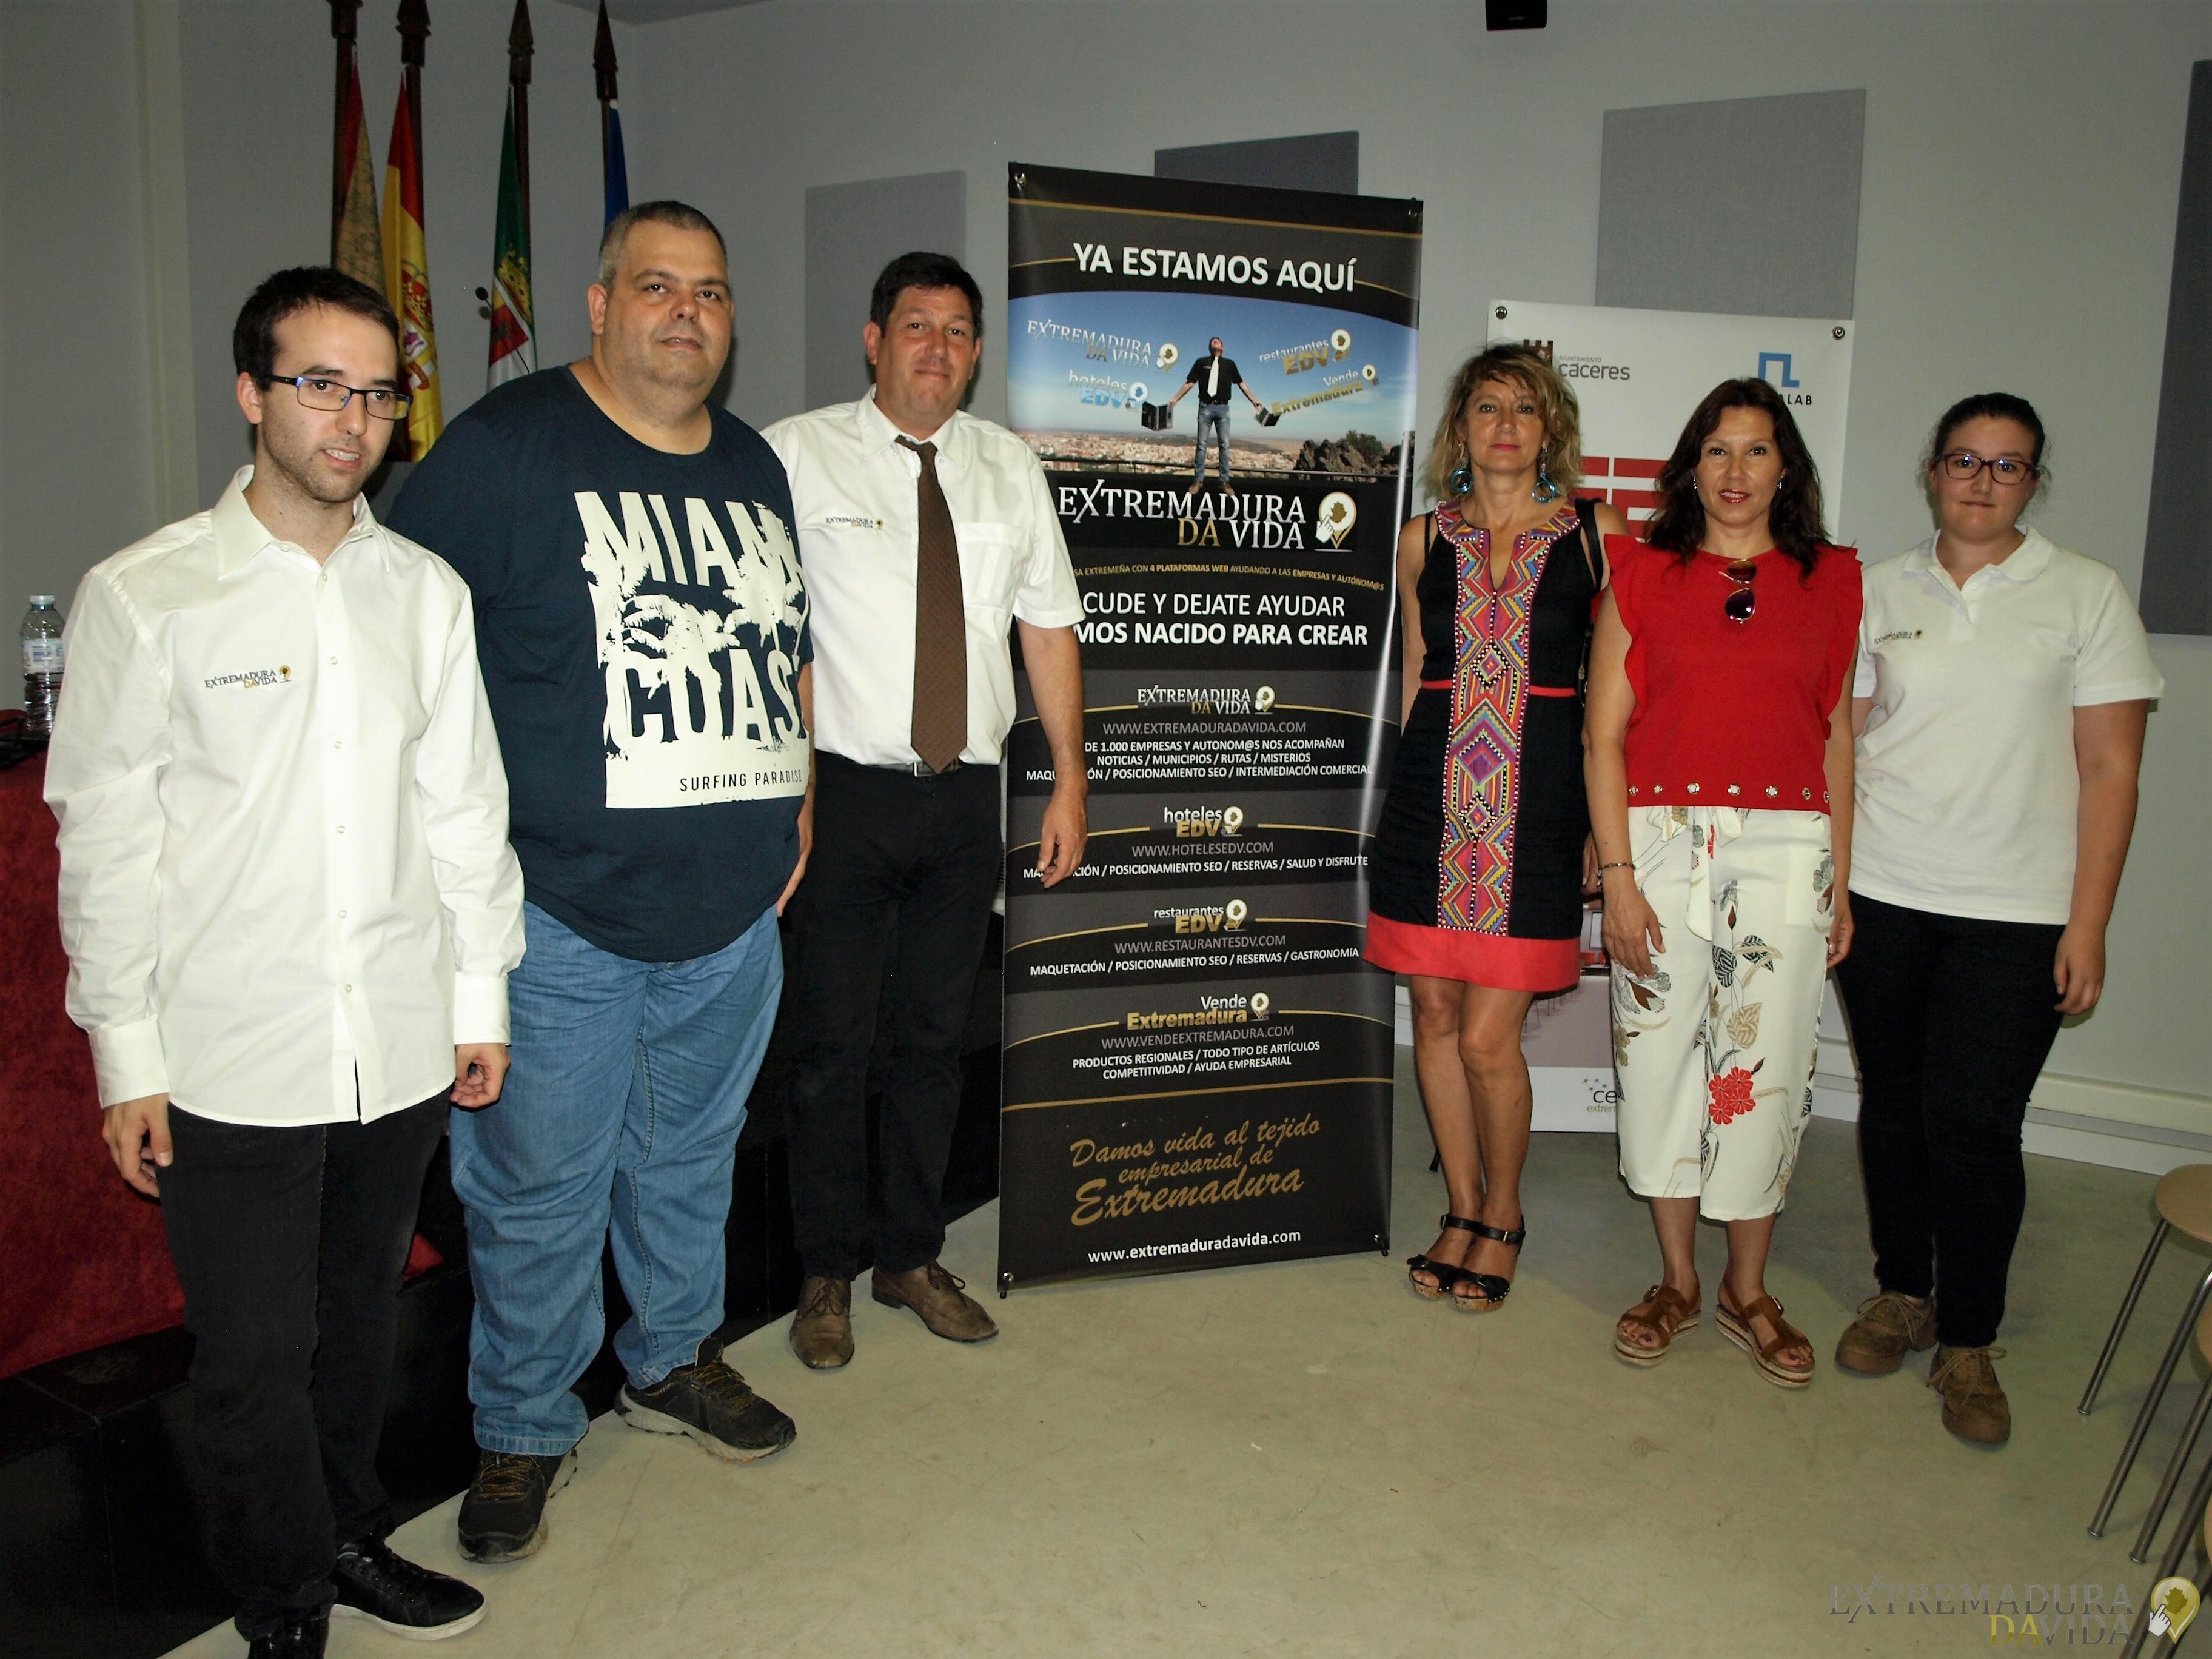 Empresas Extremeñas Extremaduradavida